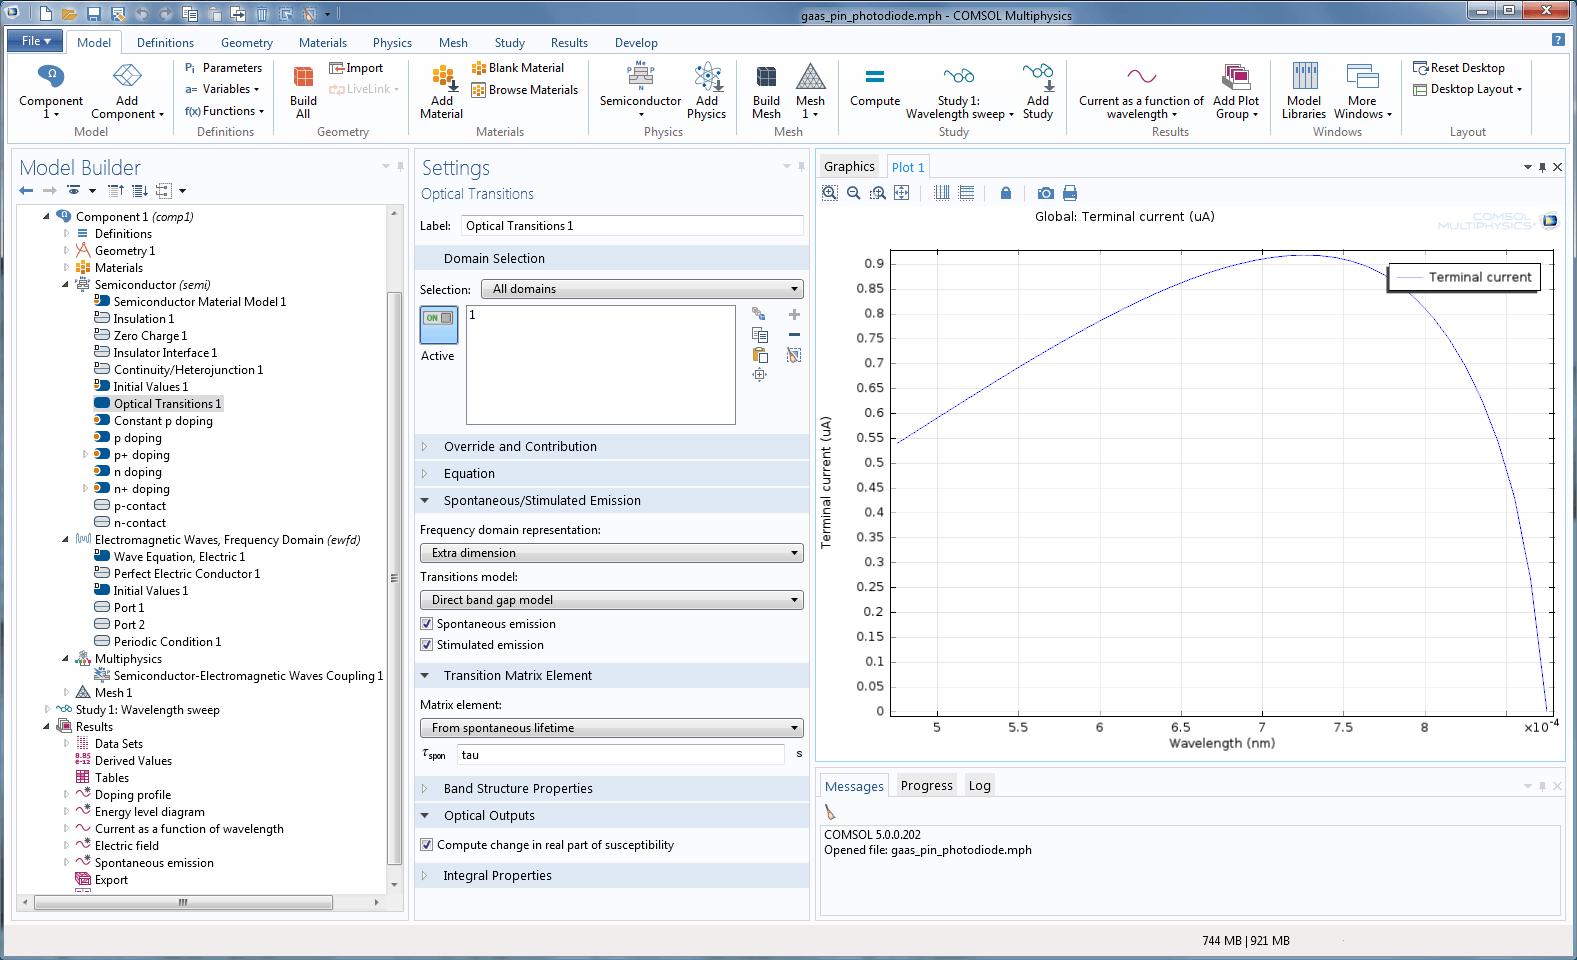 COMSOL Version 5.0 Release Highlights